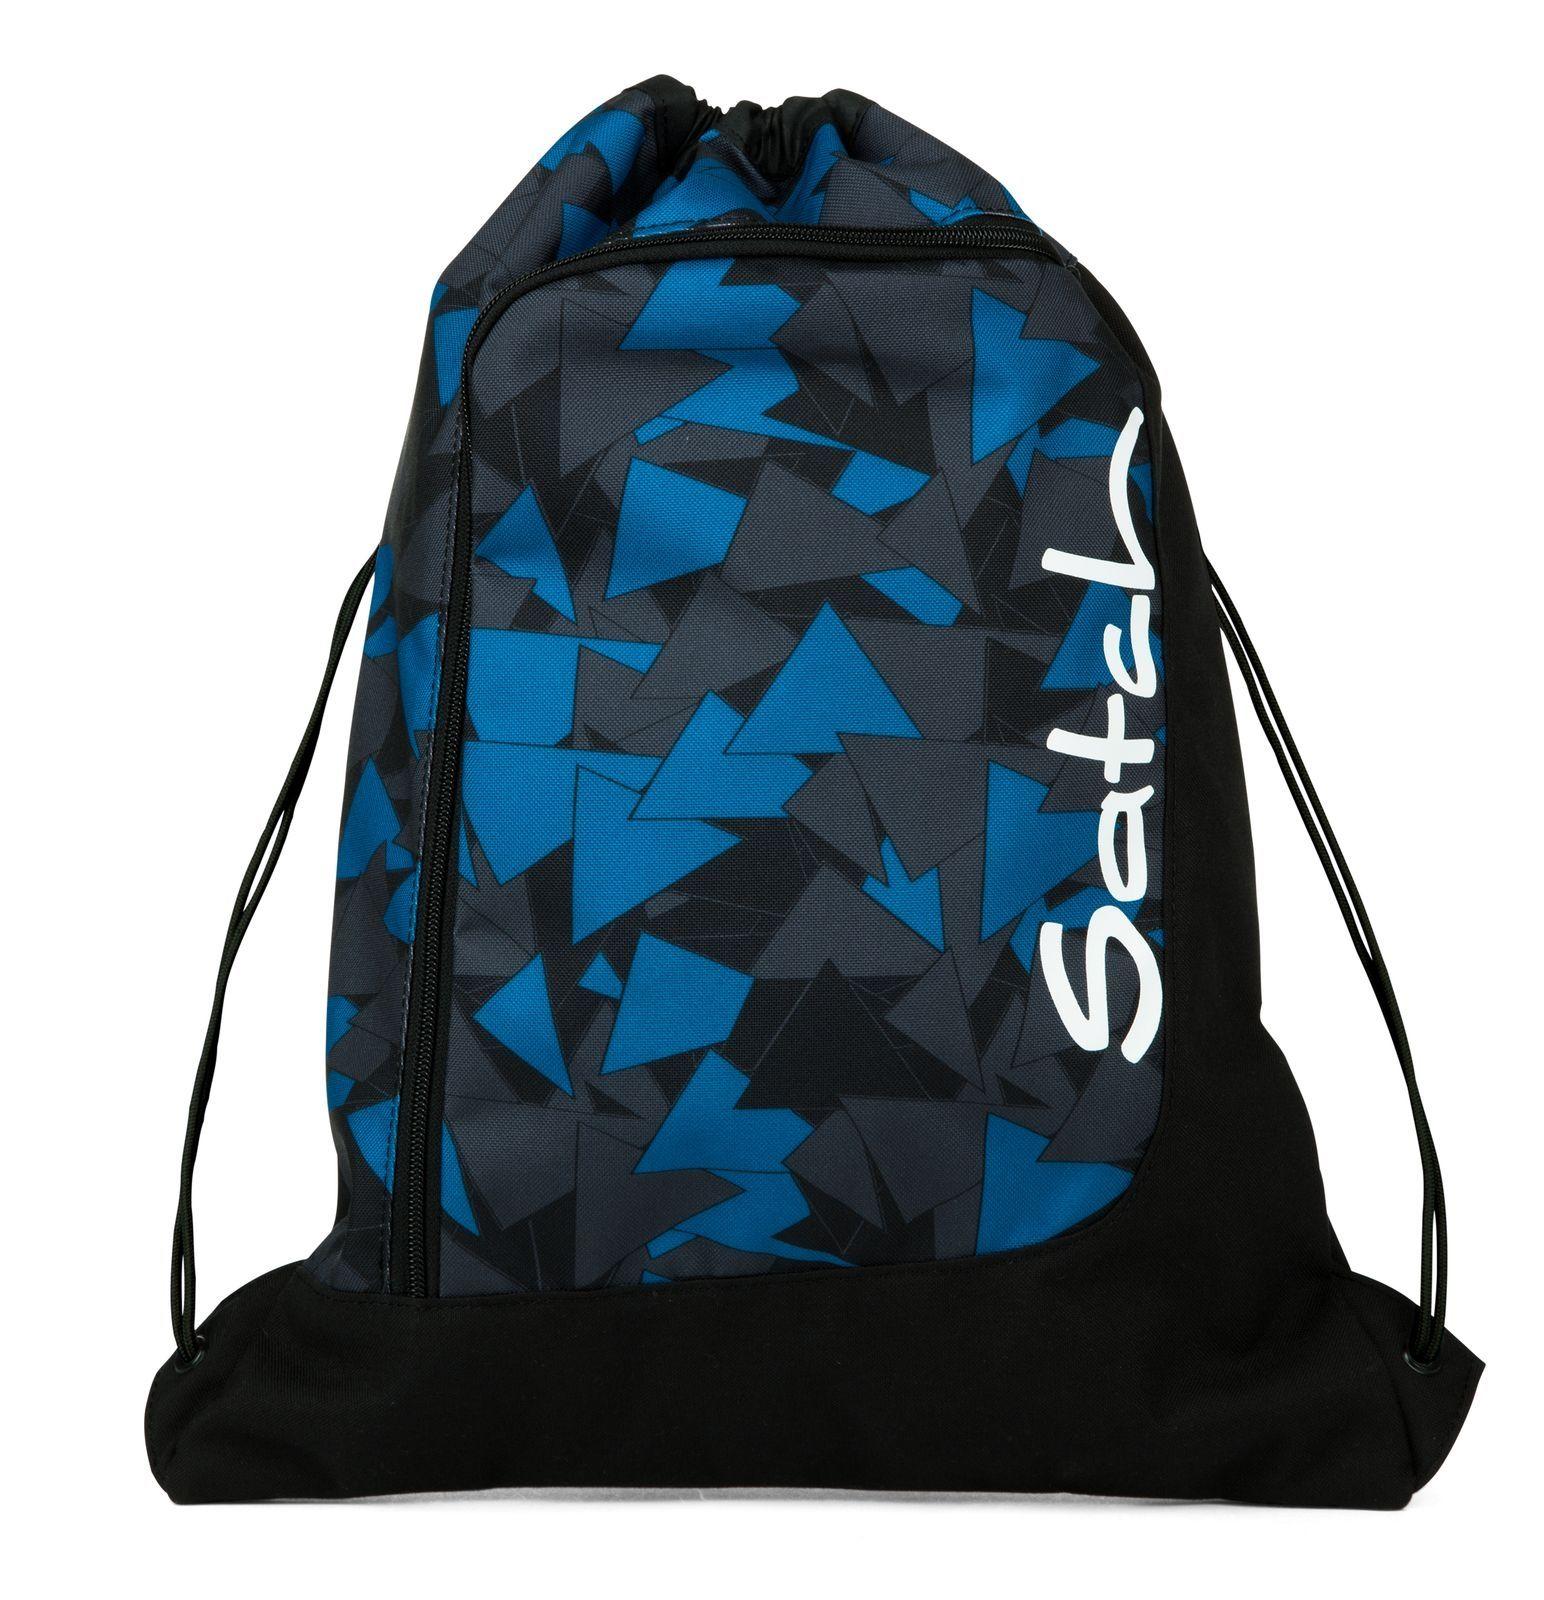 Image of Gymnastikpose fra Satch - Blue Triangle (SAT-SPO-002-9D6)